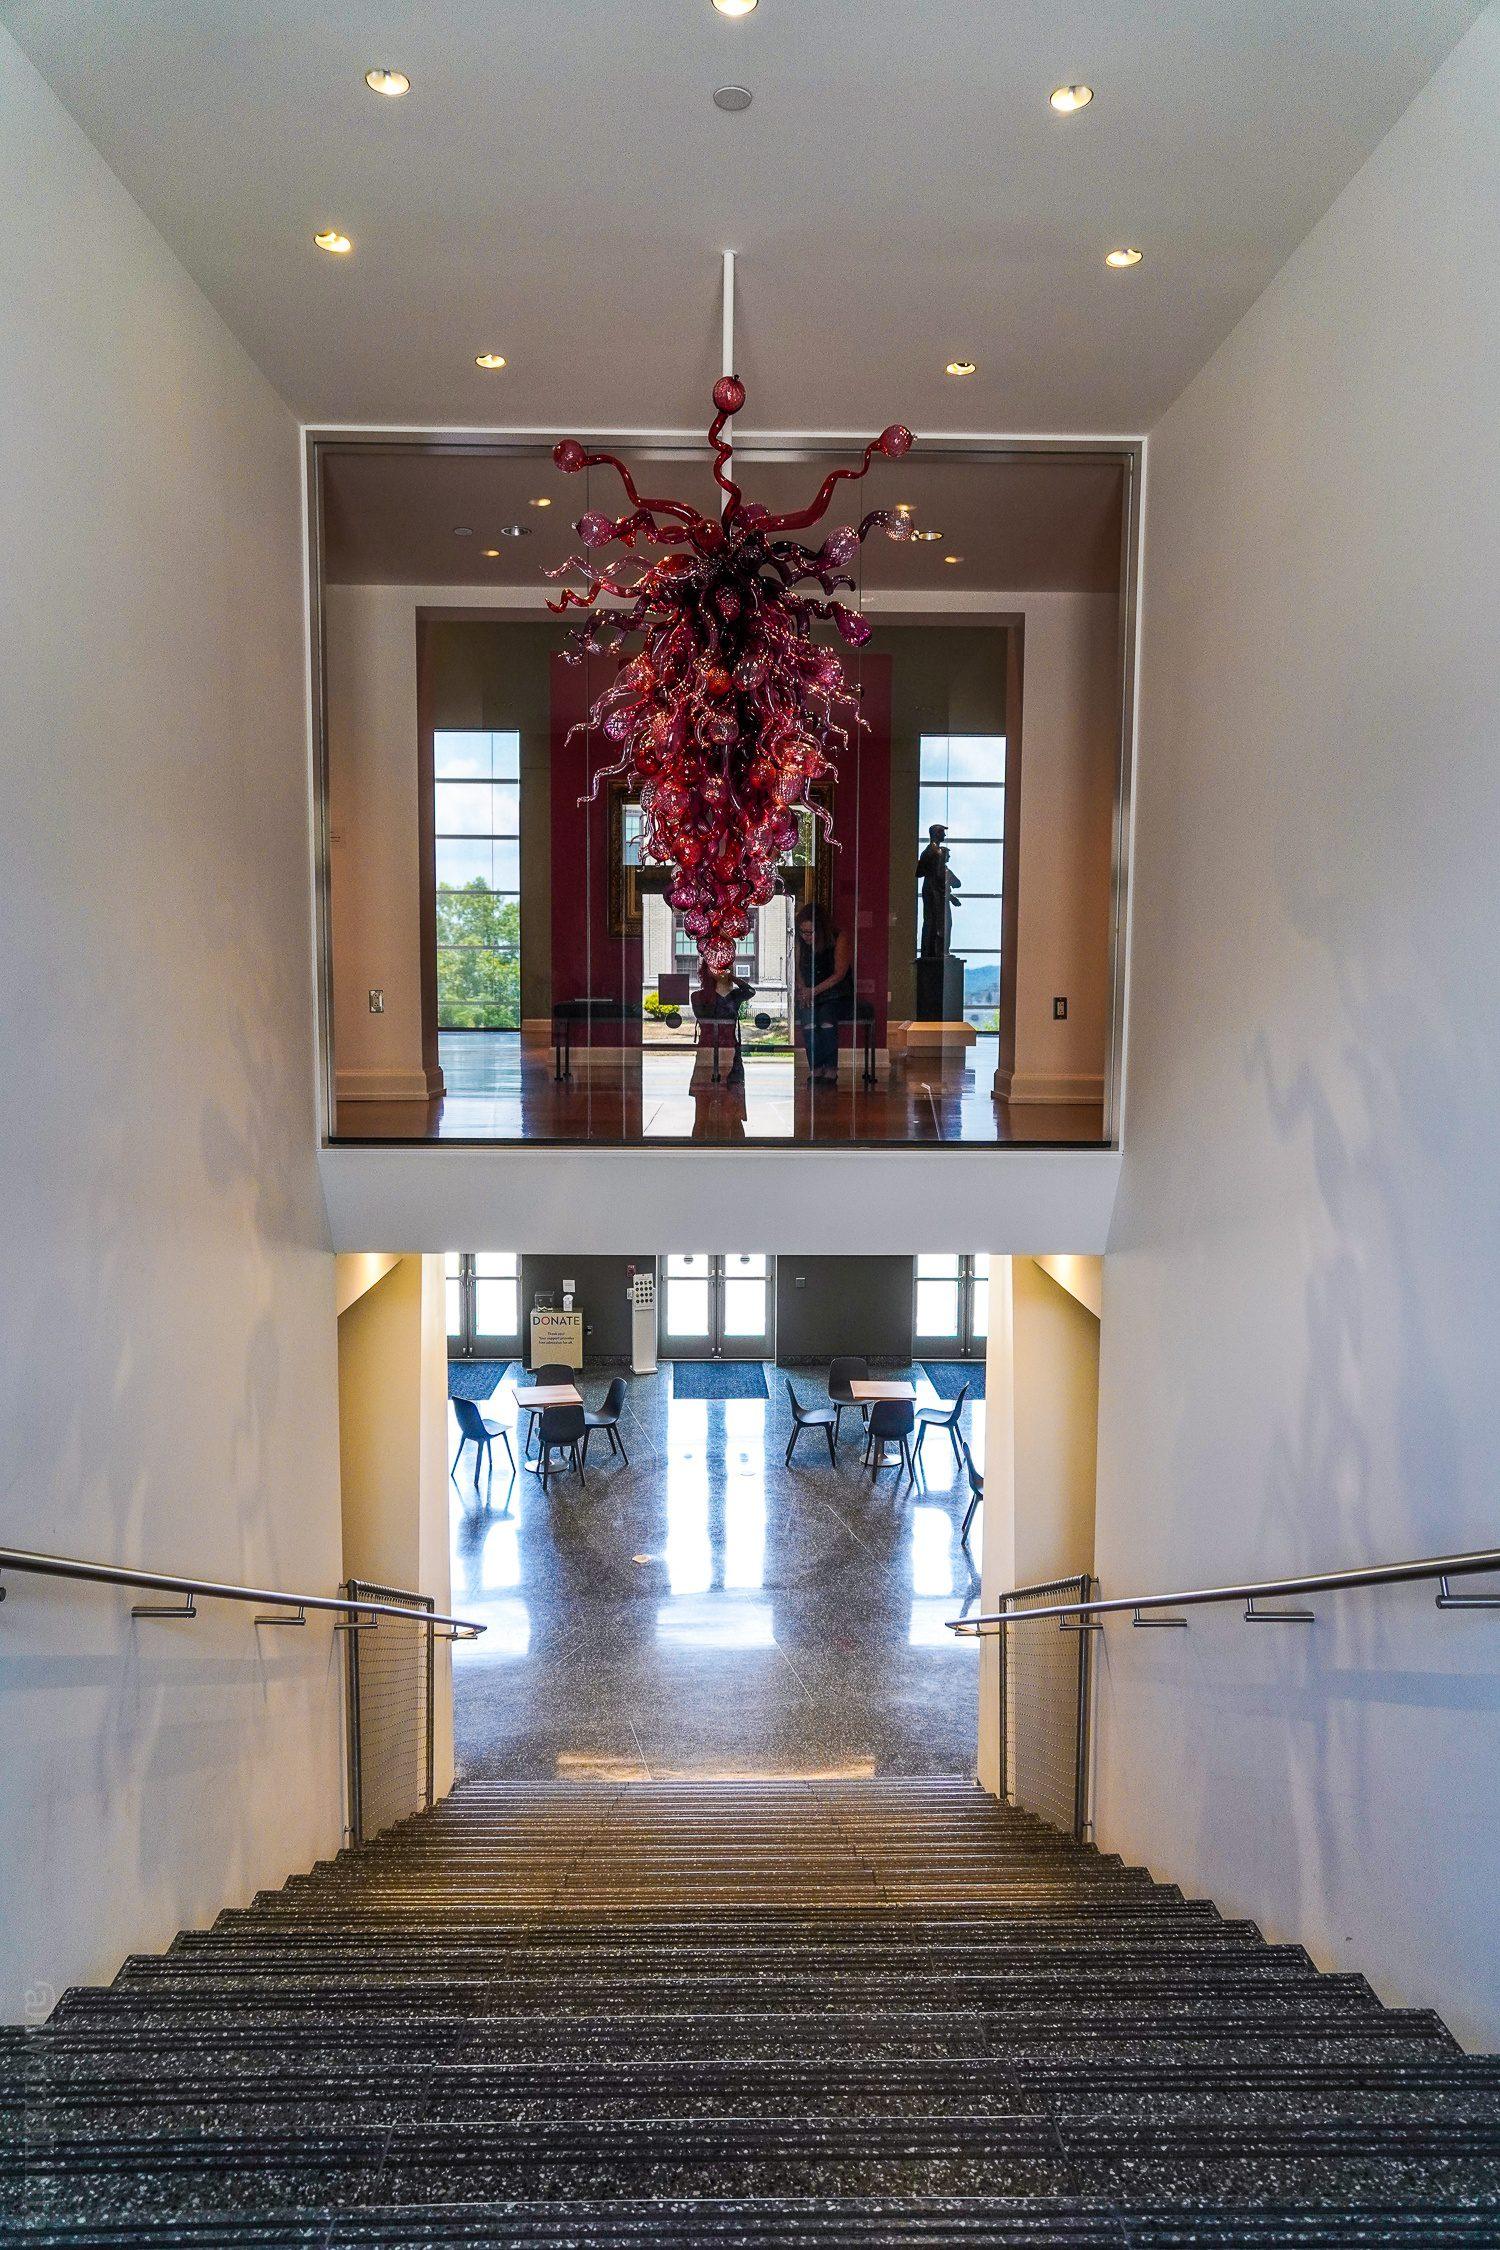 Westmoreland Museum of Art, PA